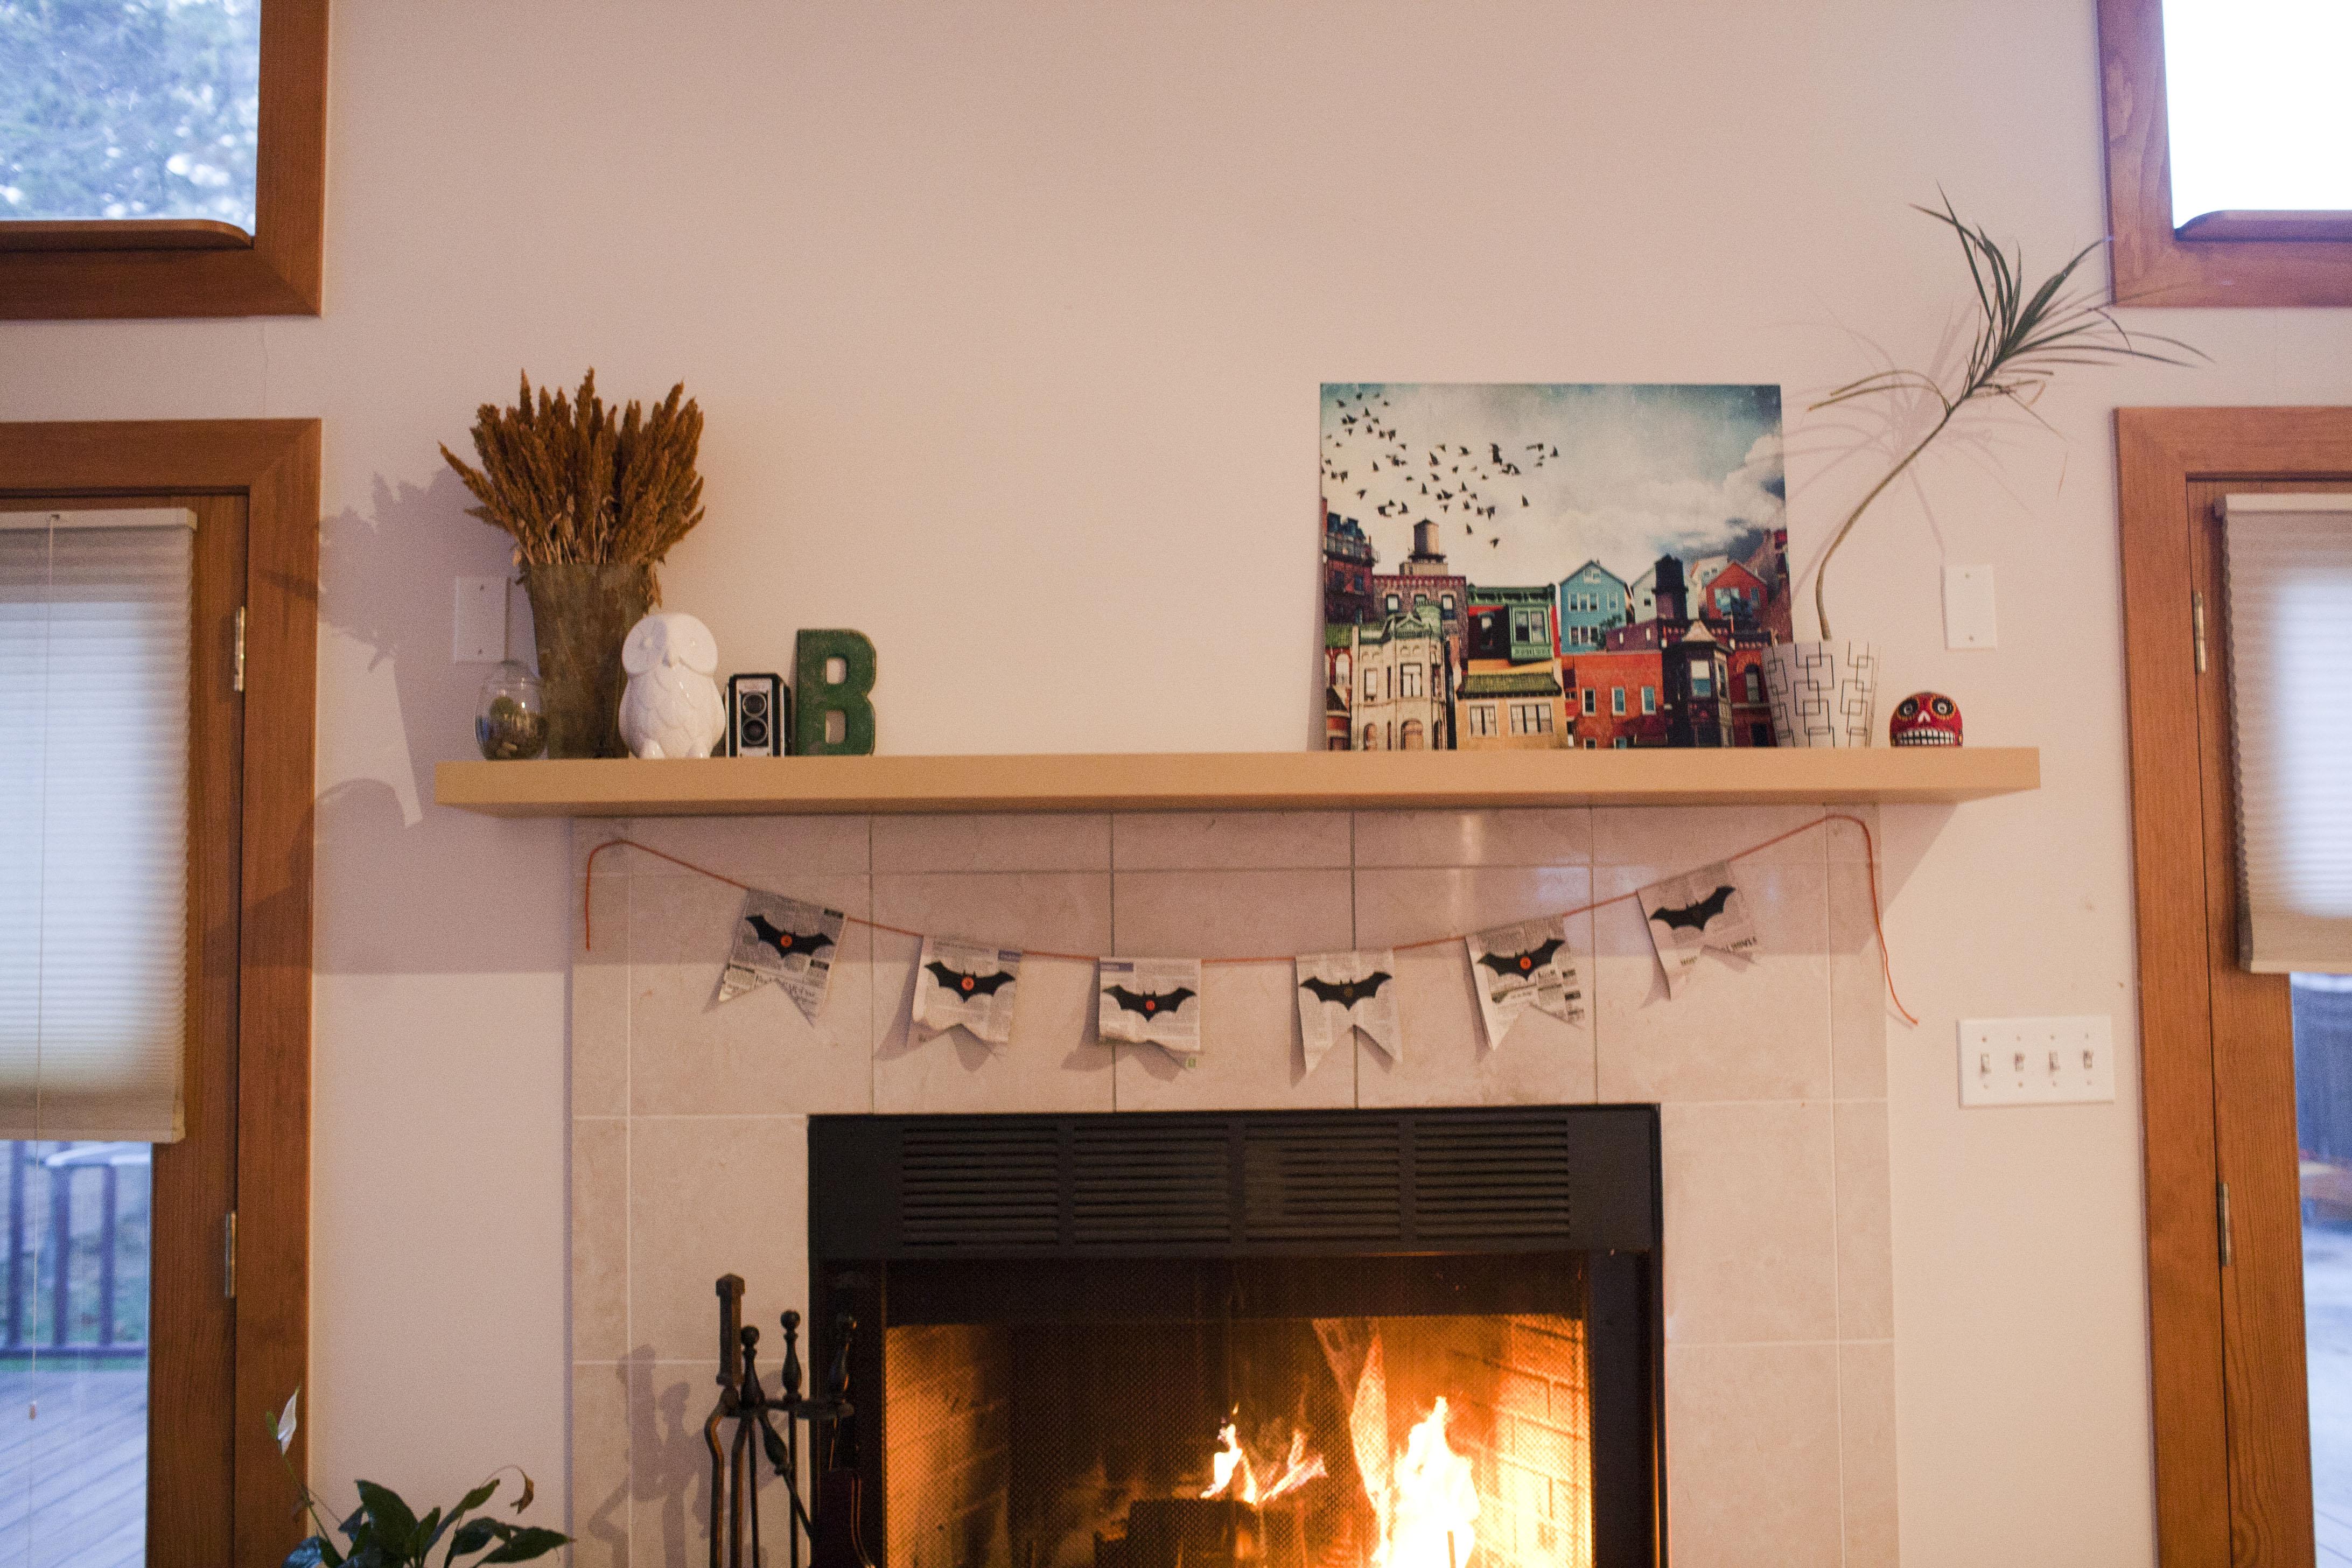 301 Fireplace Mantel Shelf